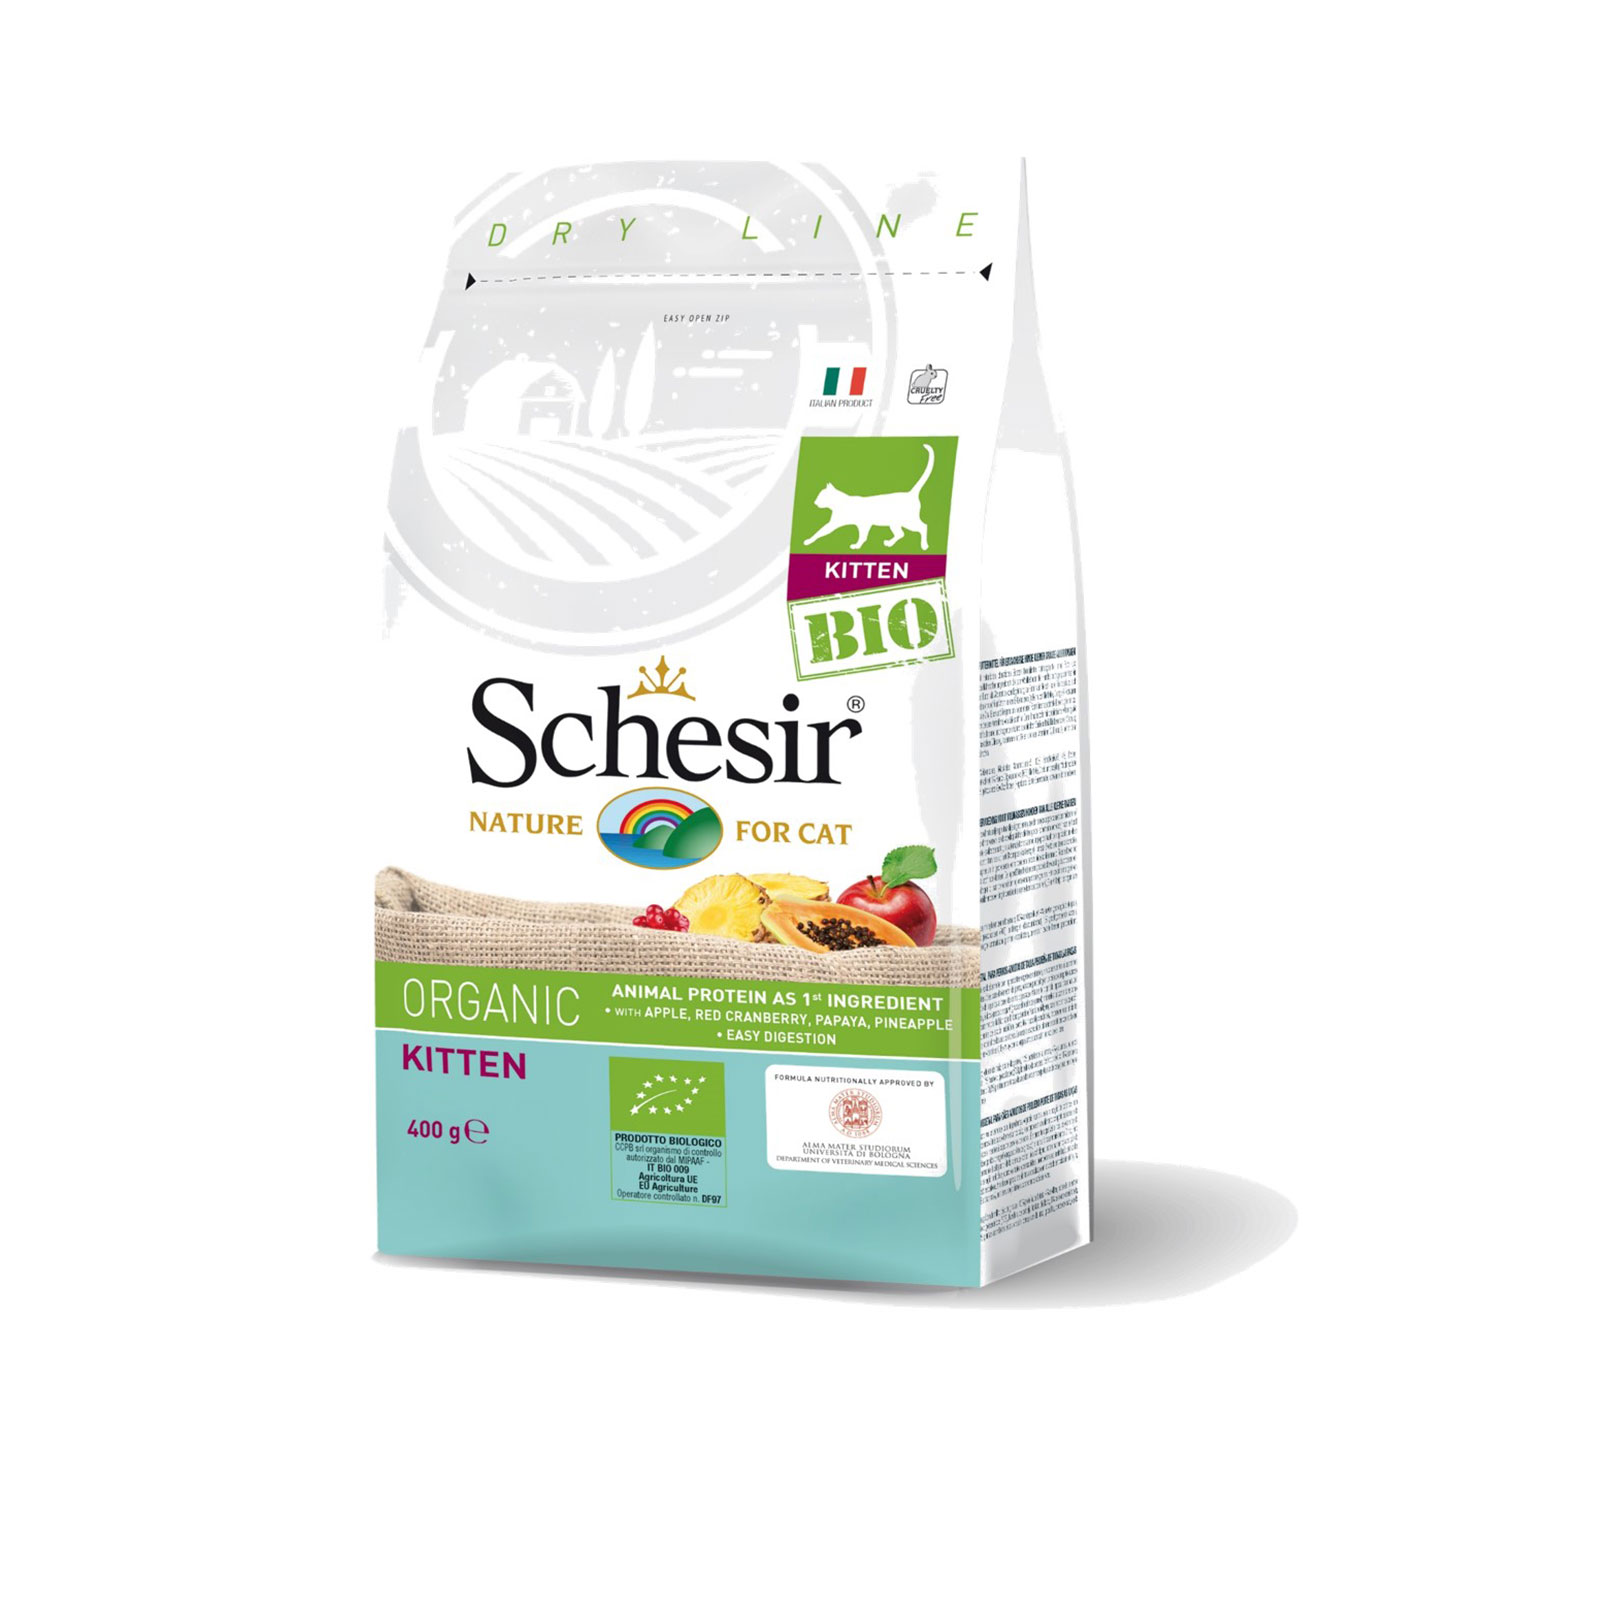 Schesir - Cat Bio Kitten - Organic hrana za mačiće